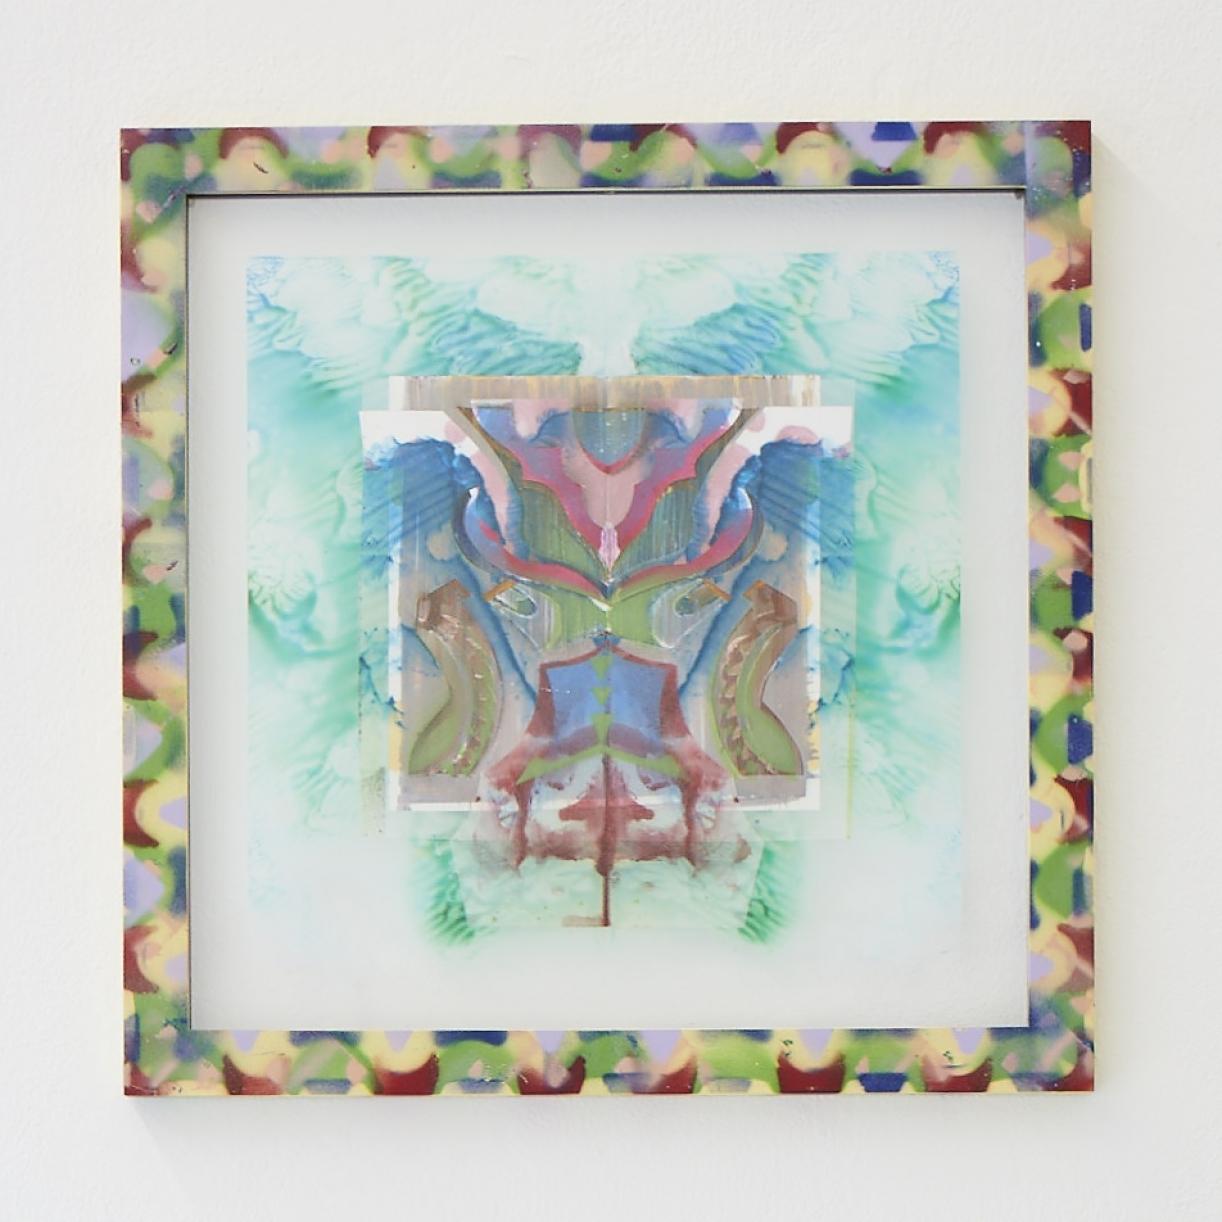 Moritz Altmann, asu, 2017, mixed media on paper and transparency, sprayed frame, 40,5 x 40,5 cm